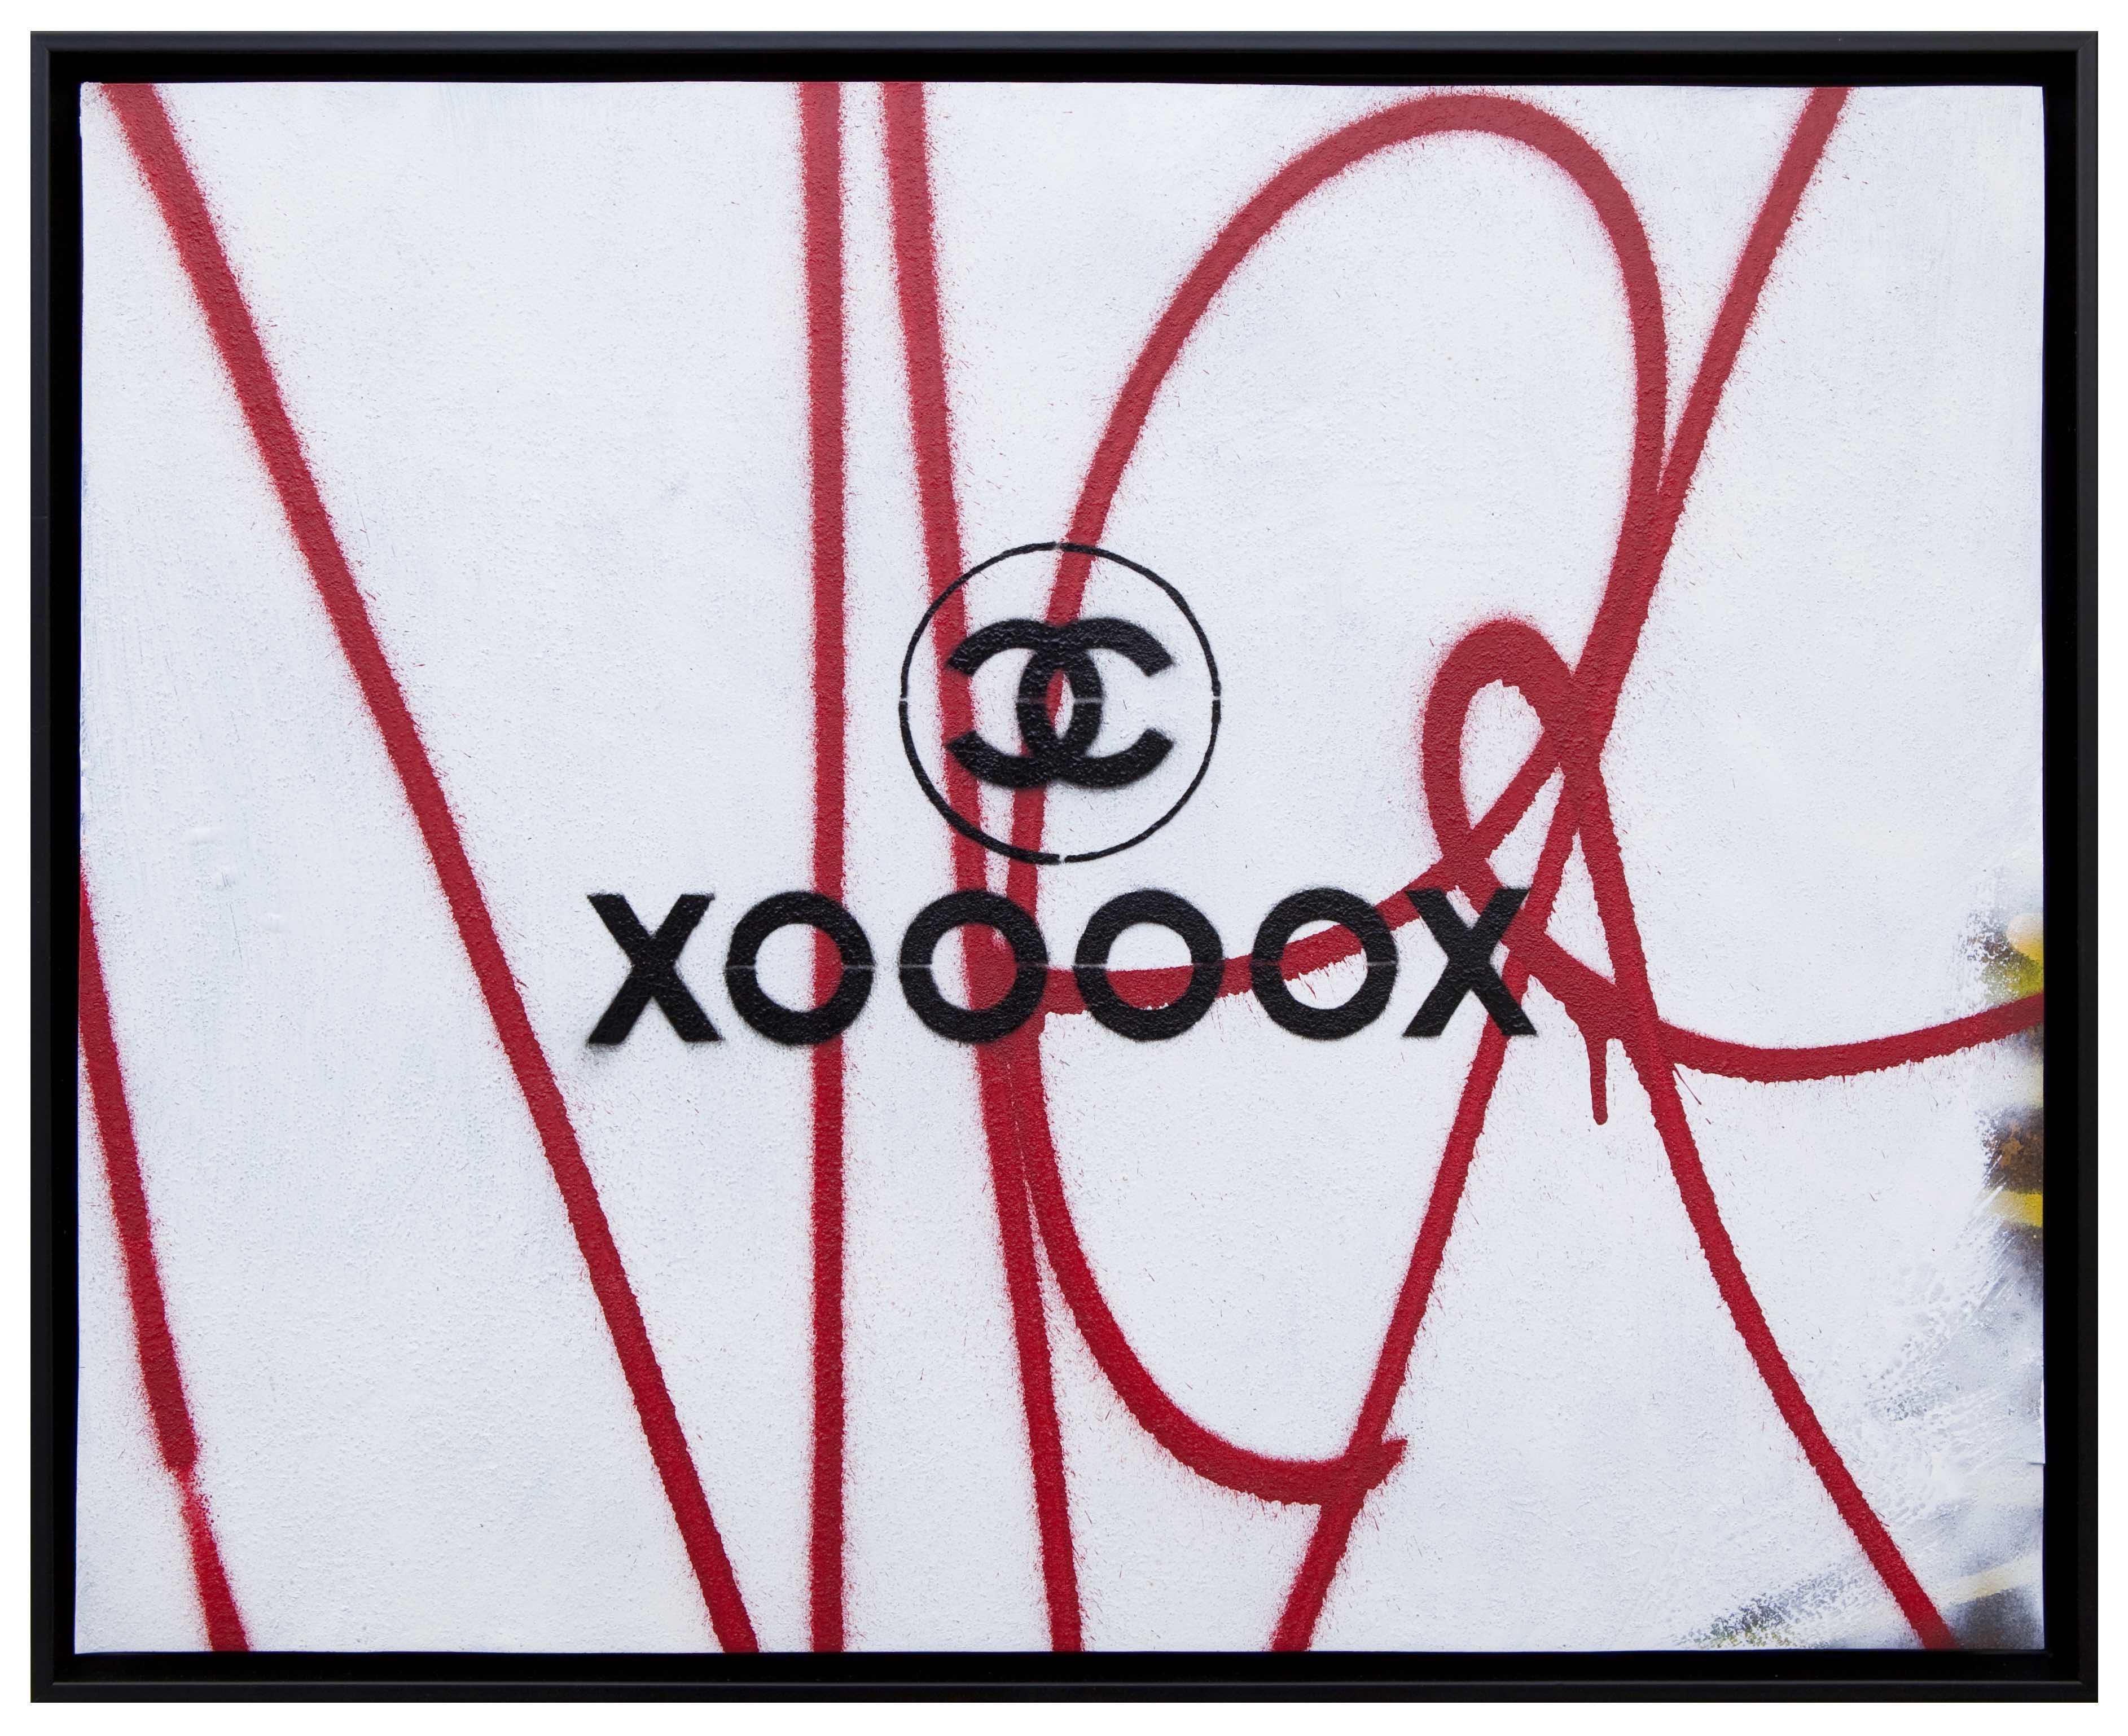 xoooox-chanel-mer-2018-405x505cm